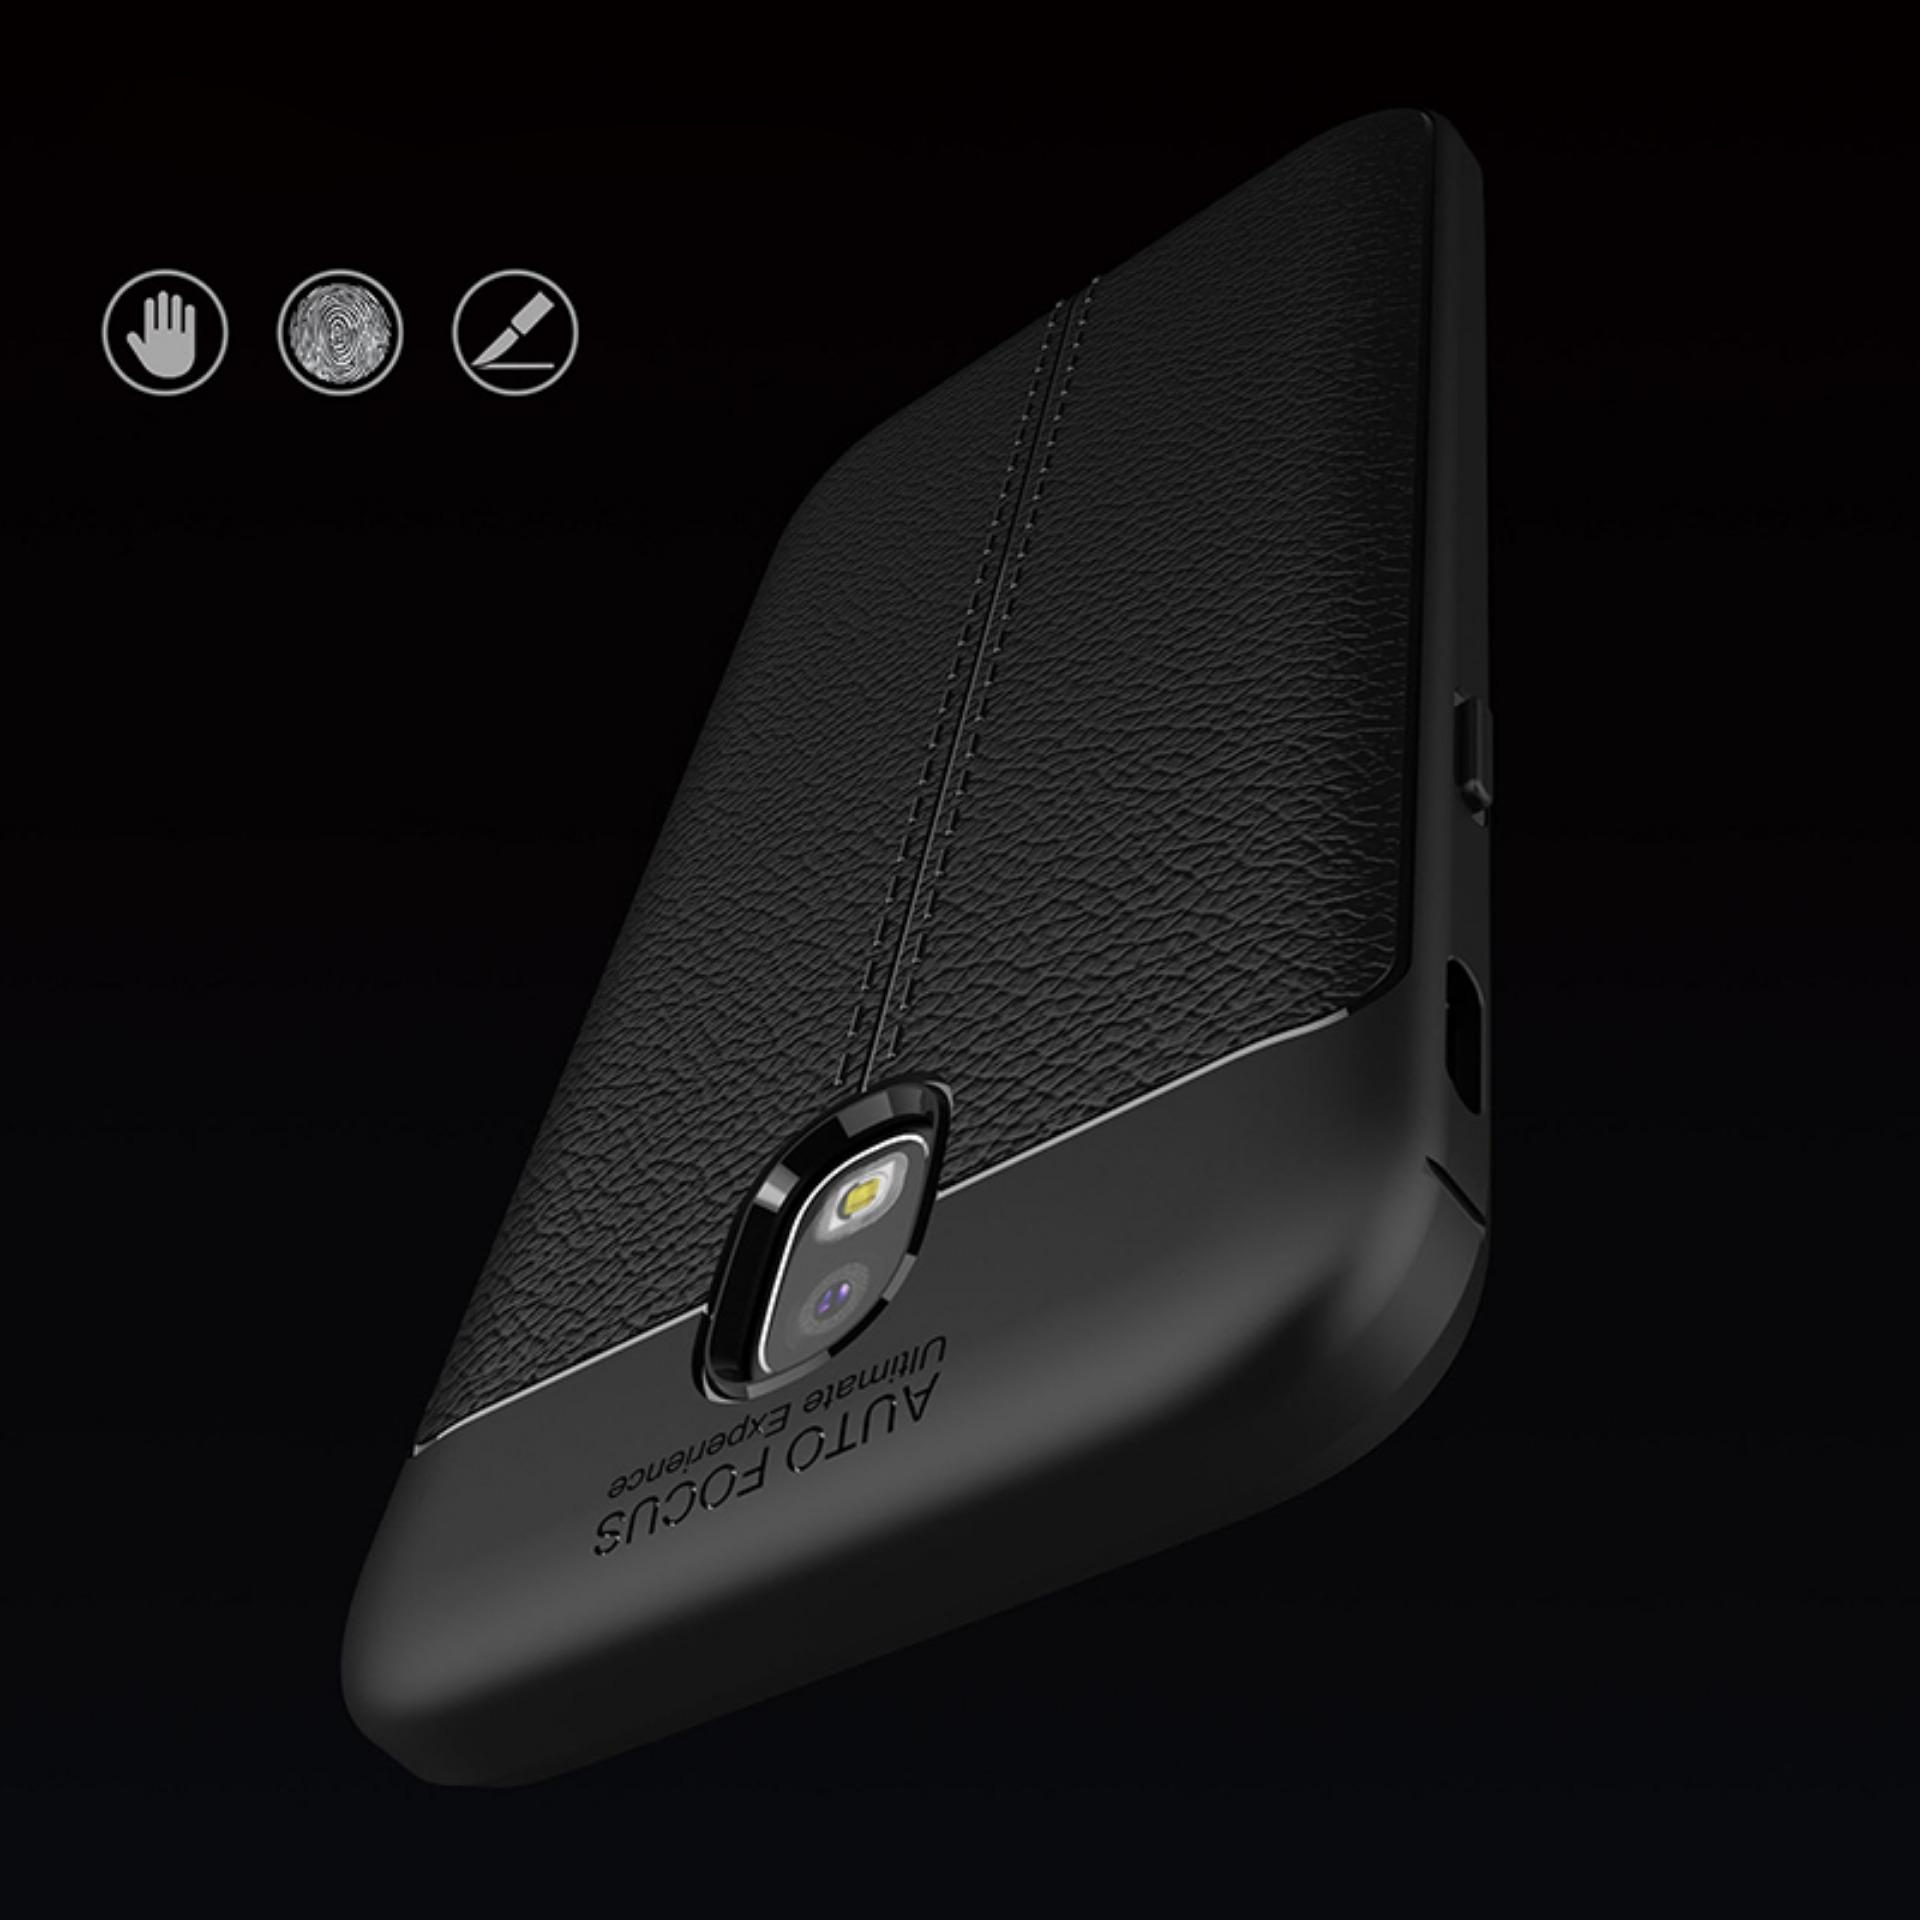 Case Carbon For Samsung Galaxy J5 Pro 2017 Ultraslim Premium Peonia Shockproof J530 Black Hitam Original Lazada Auto Focus